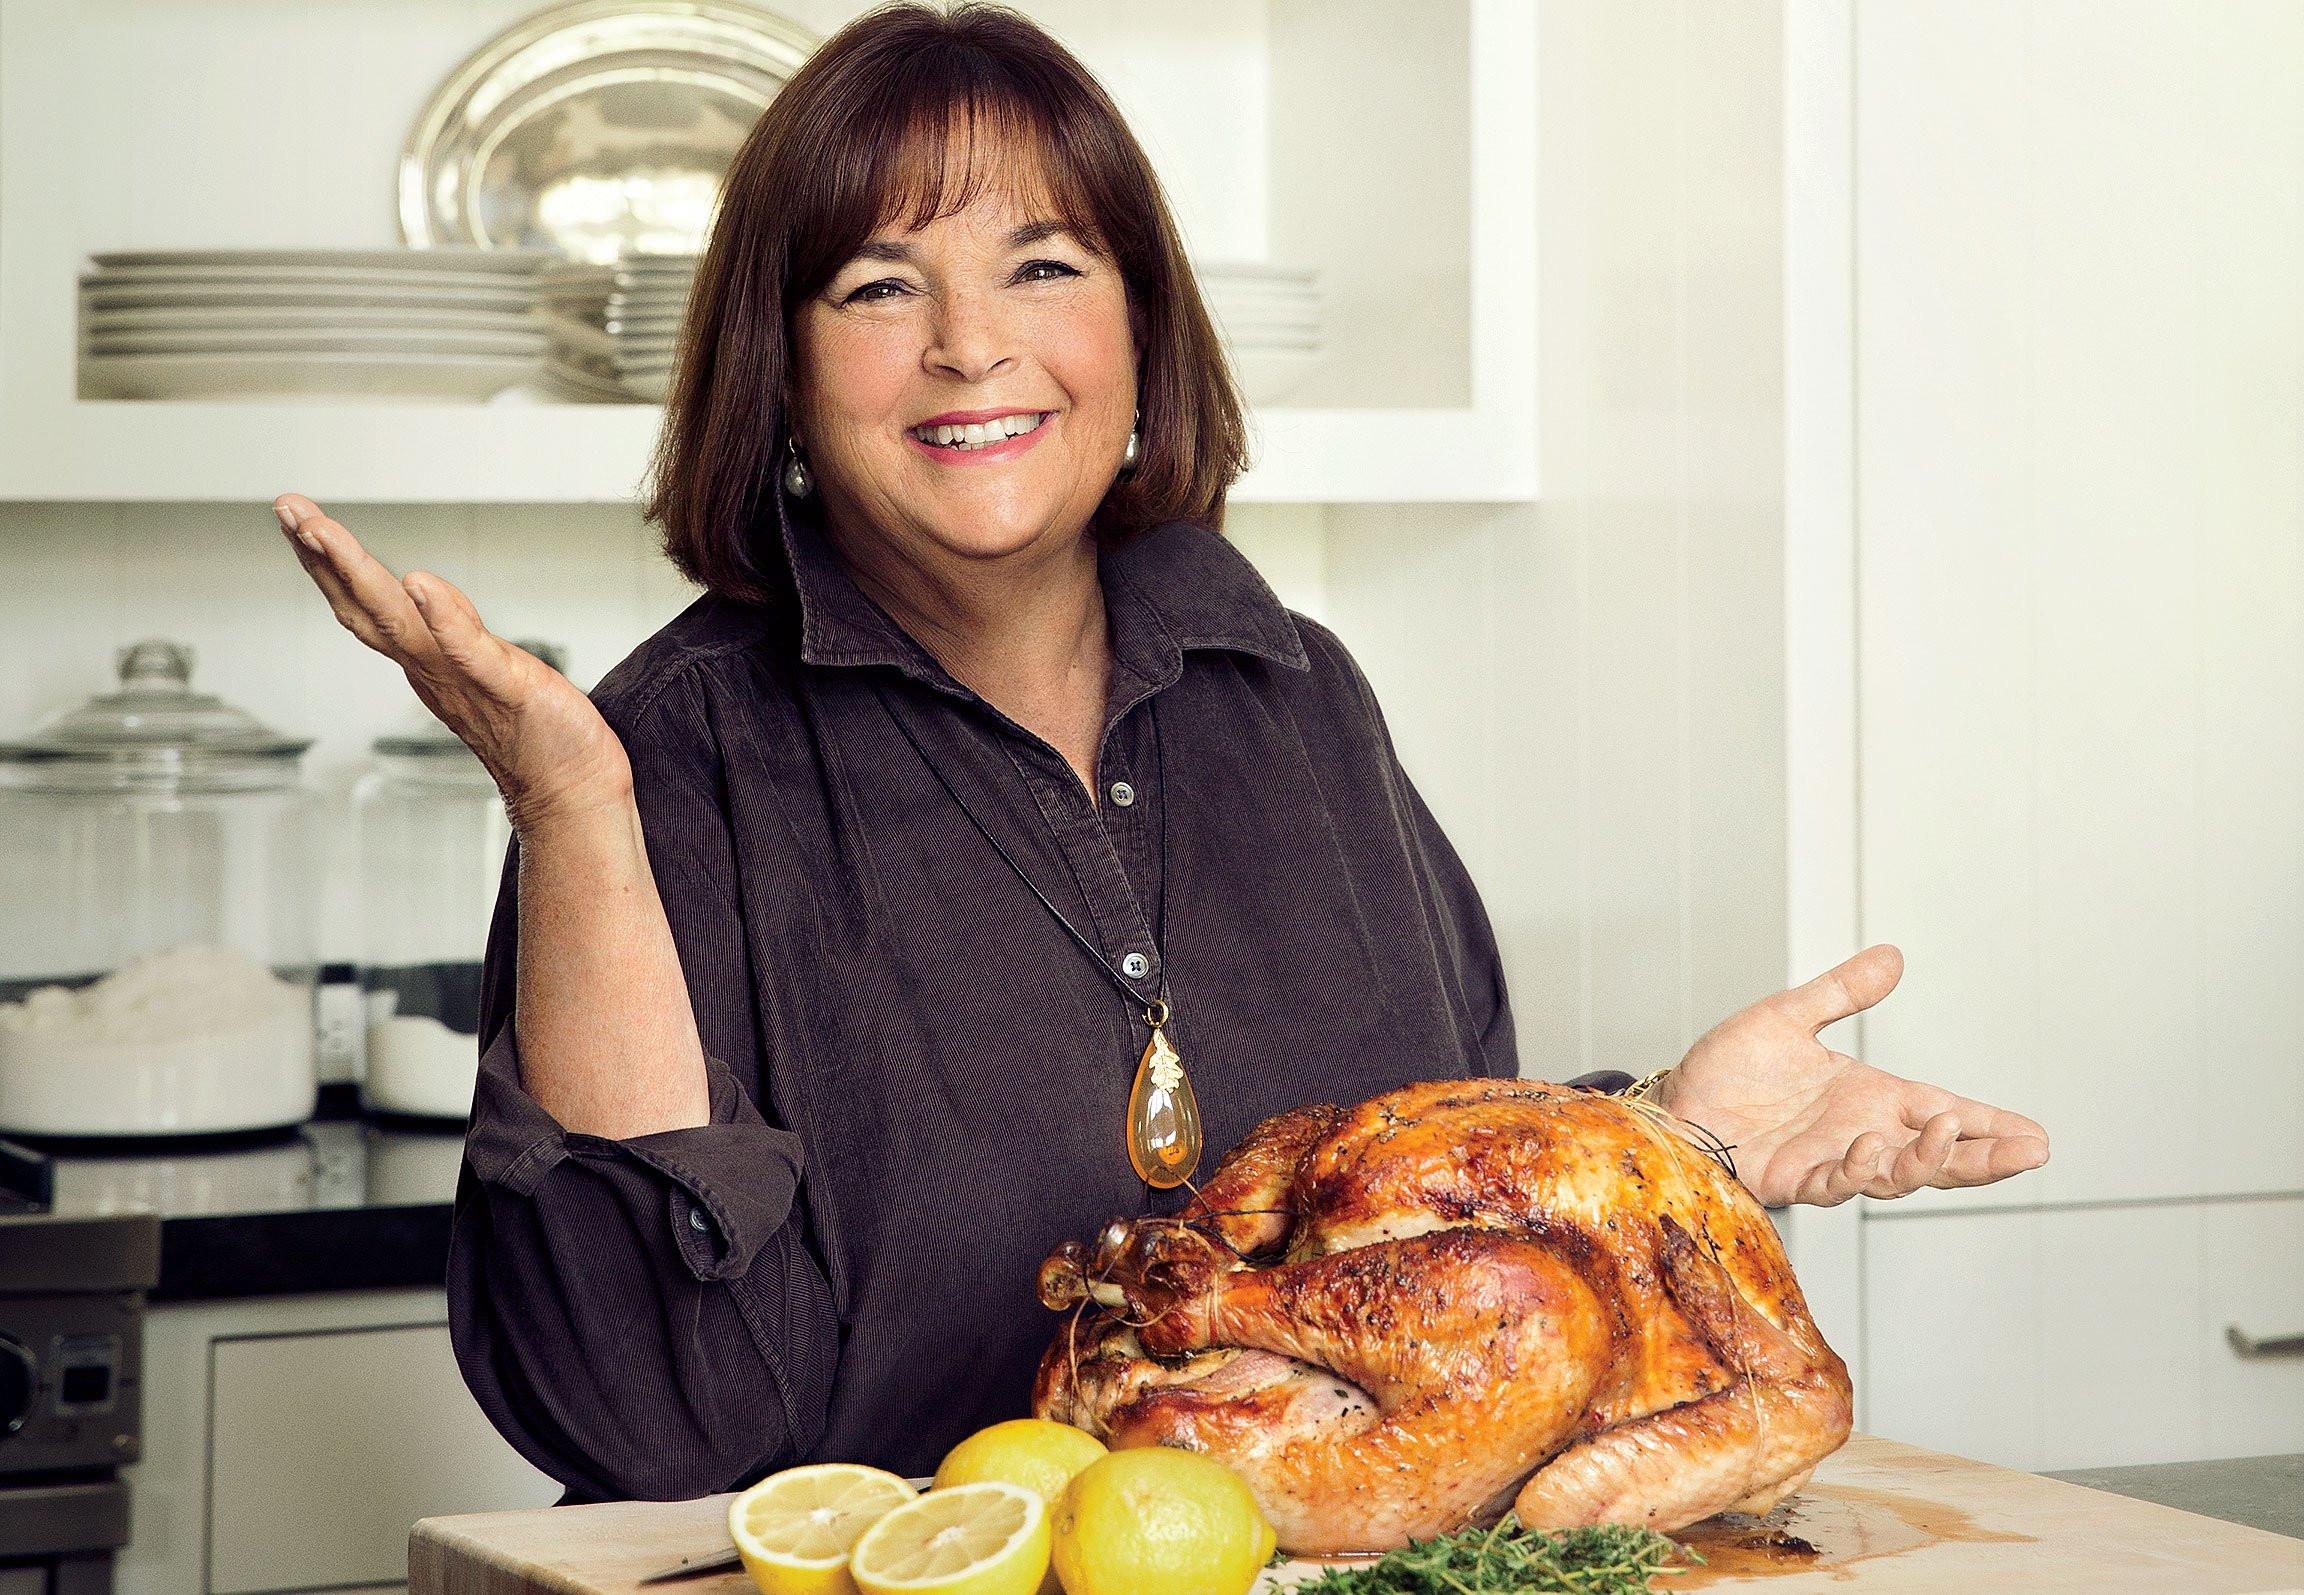 Ina Garten Make Ahead Thanksgiving  Have A Make Ahead Thanksgiving With Barefoot Contessa Ina